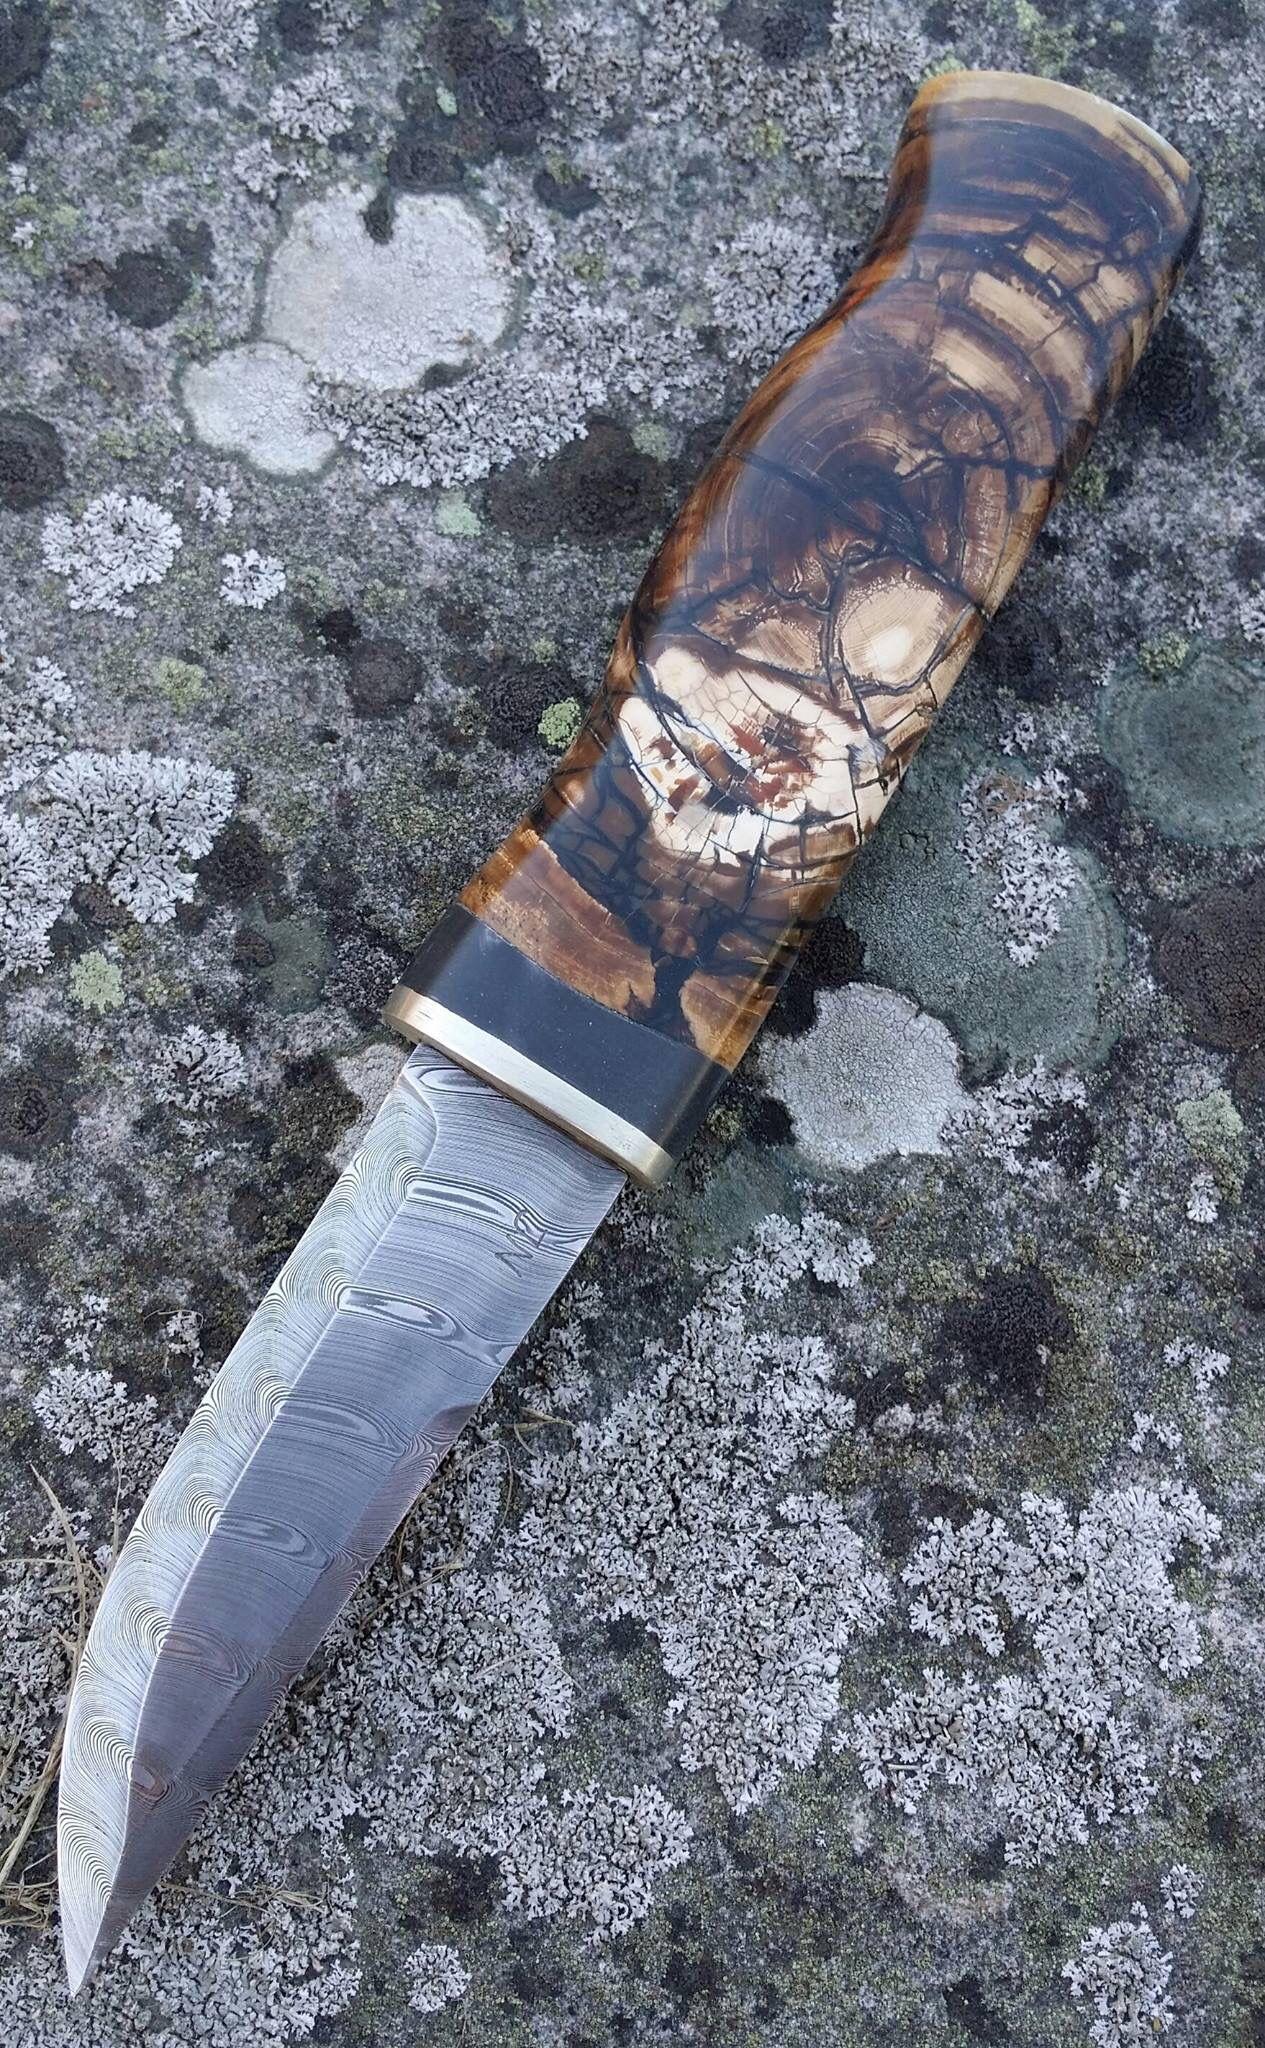 Fabulous 25000-year shaft made of mammoth ivory by a Swedish knife